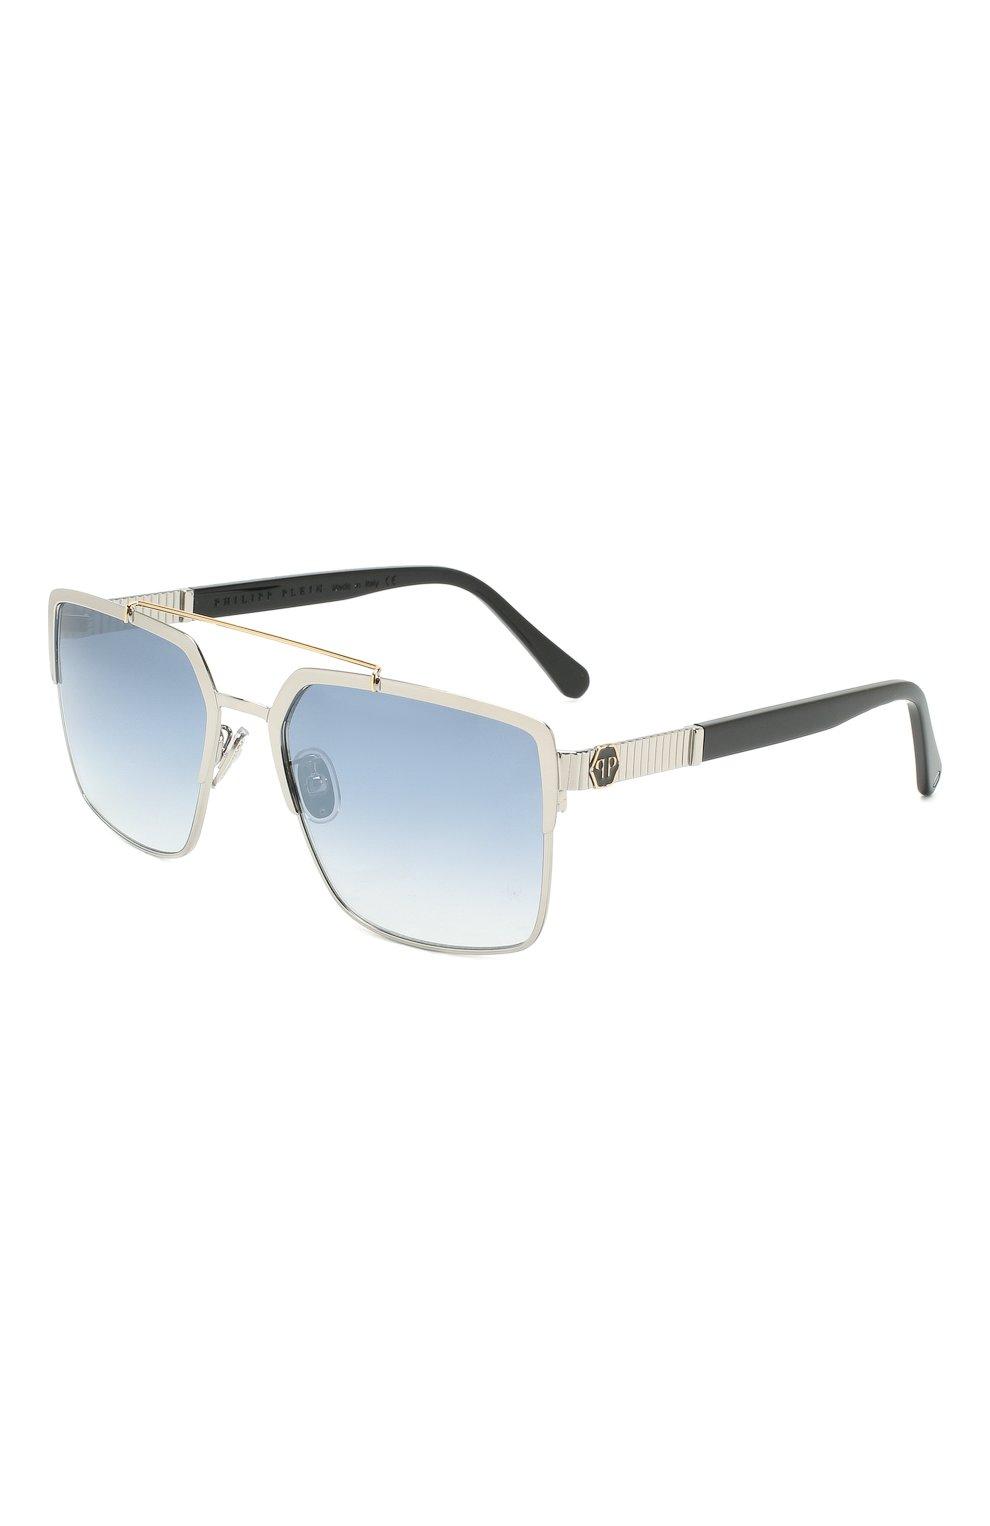 Мужские солнцезащитные очки PHILIPP PLEIN серого цвета, арт. UES0065 | Фото 1